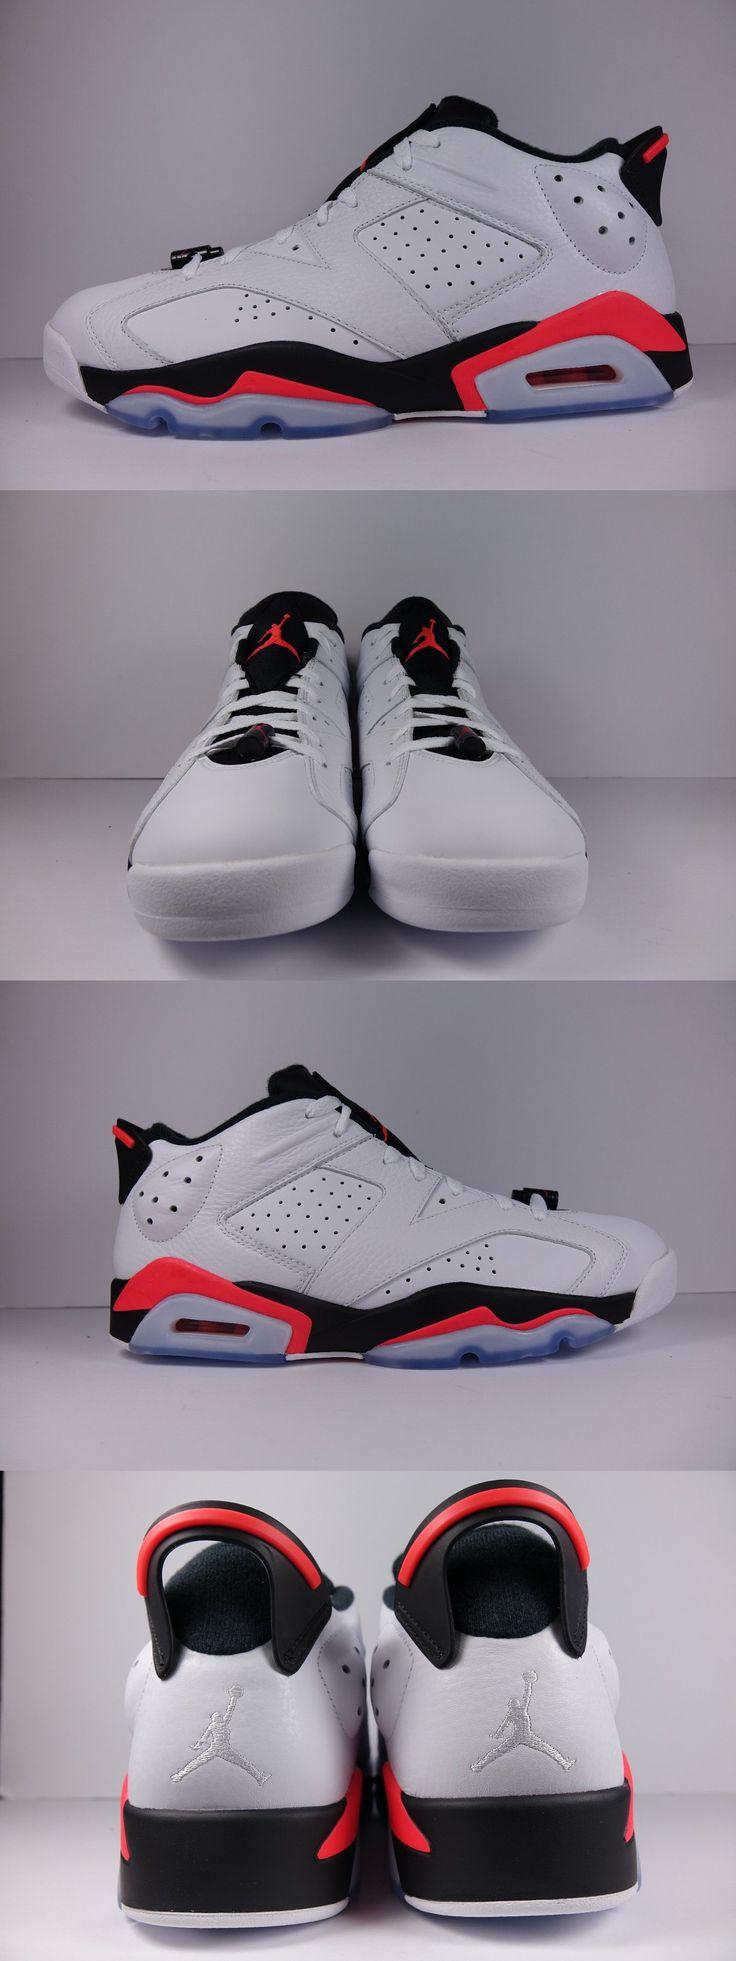 Basketball: Nike Air Jordan Retro Vi 6 Low Infrared White Size 12 Brand New -> BUY IT NOW ONLY: $169.99 on eBay!